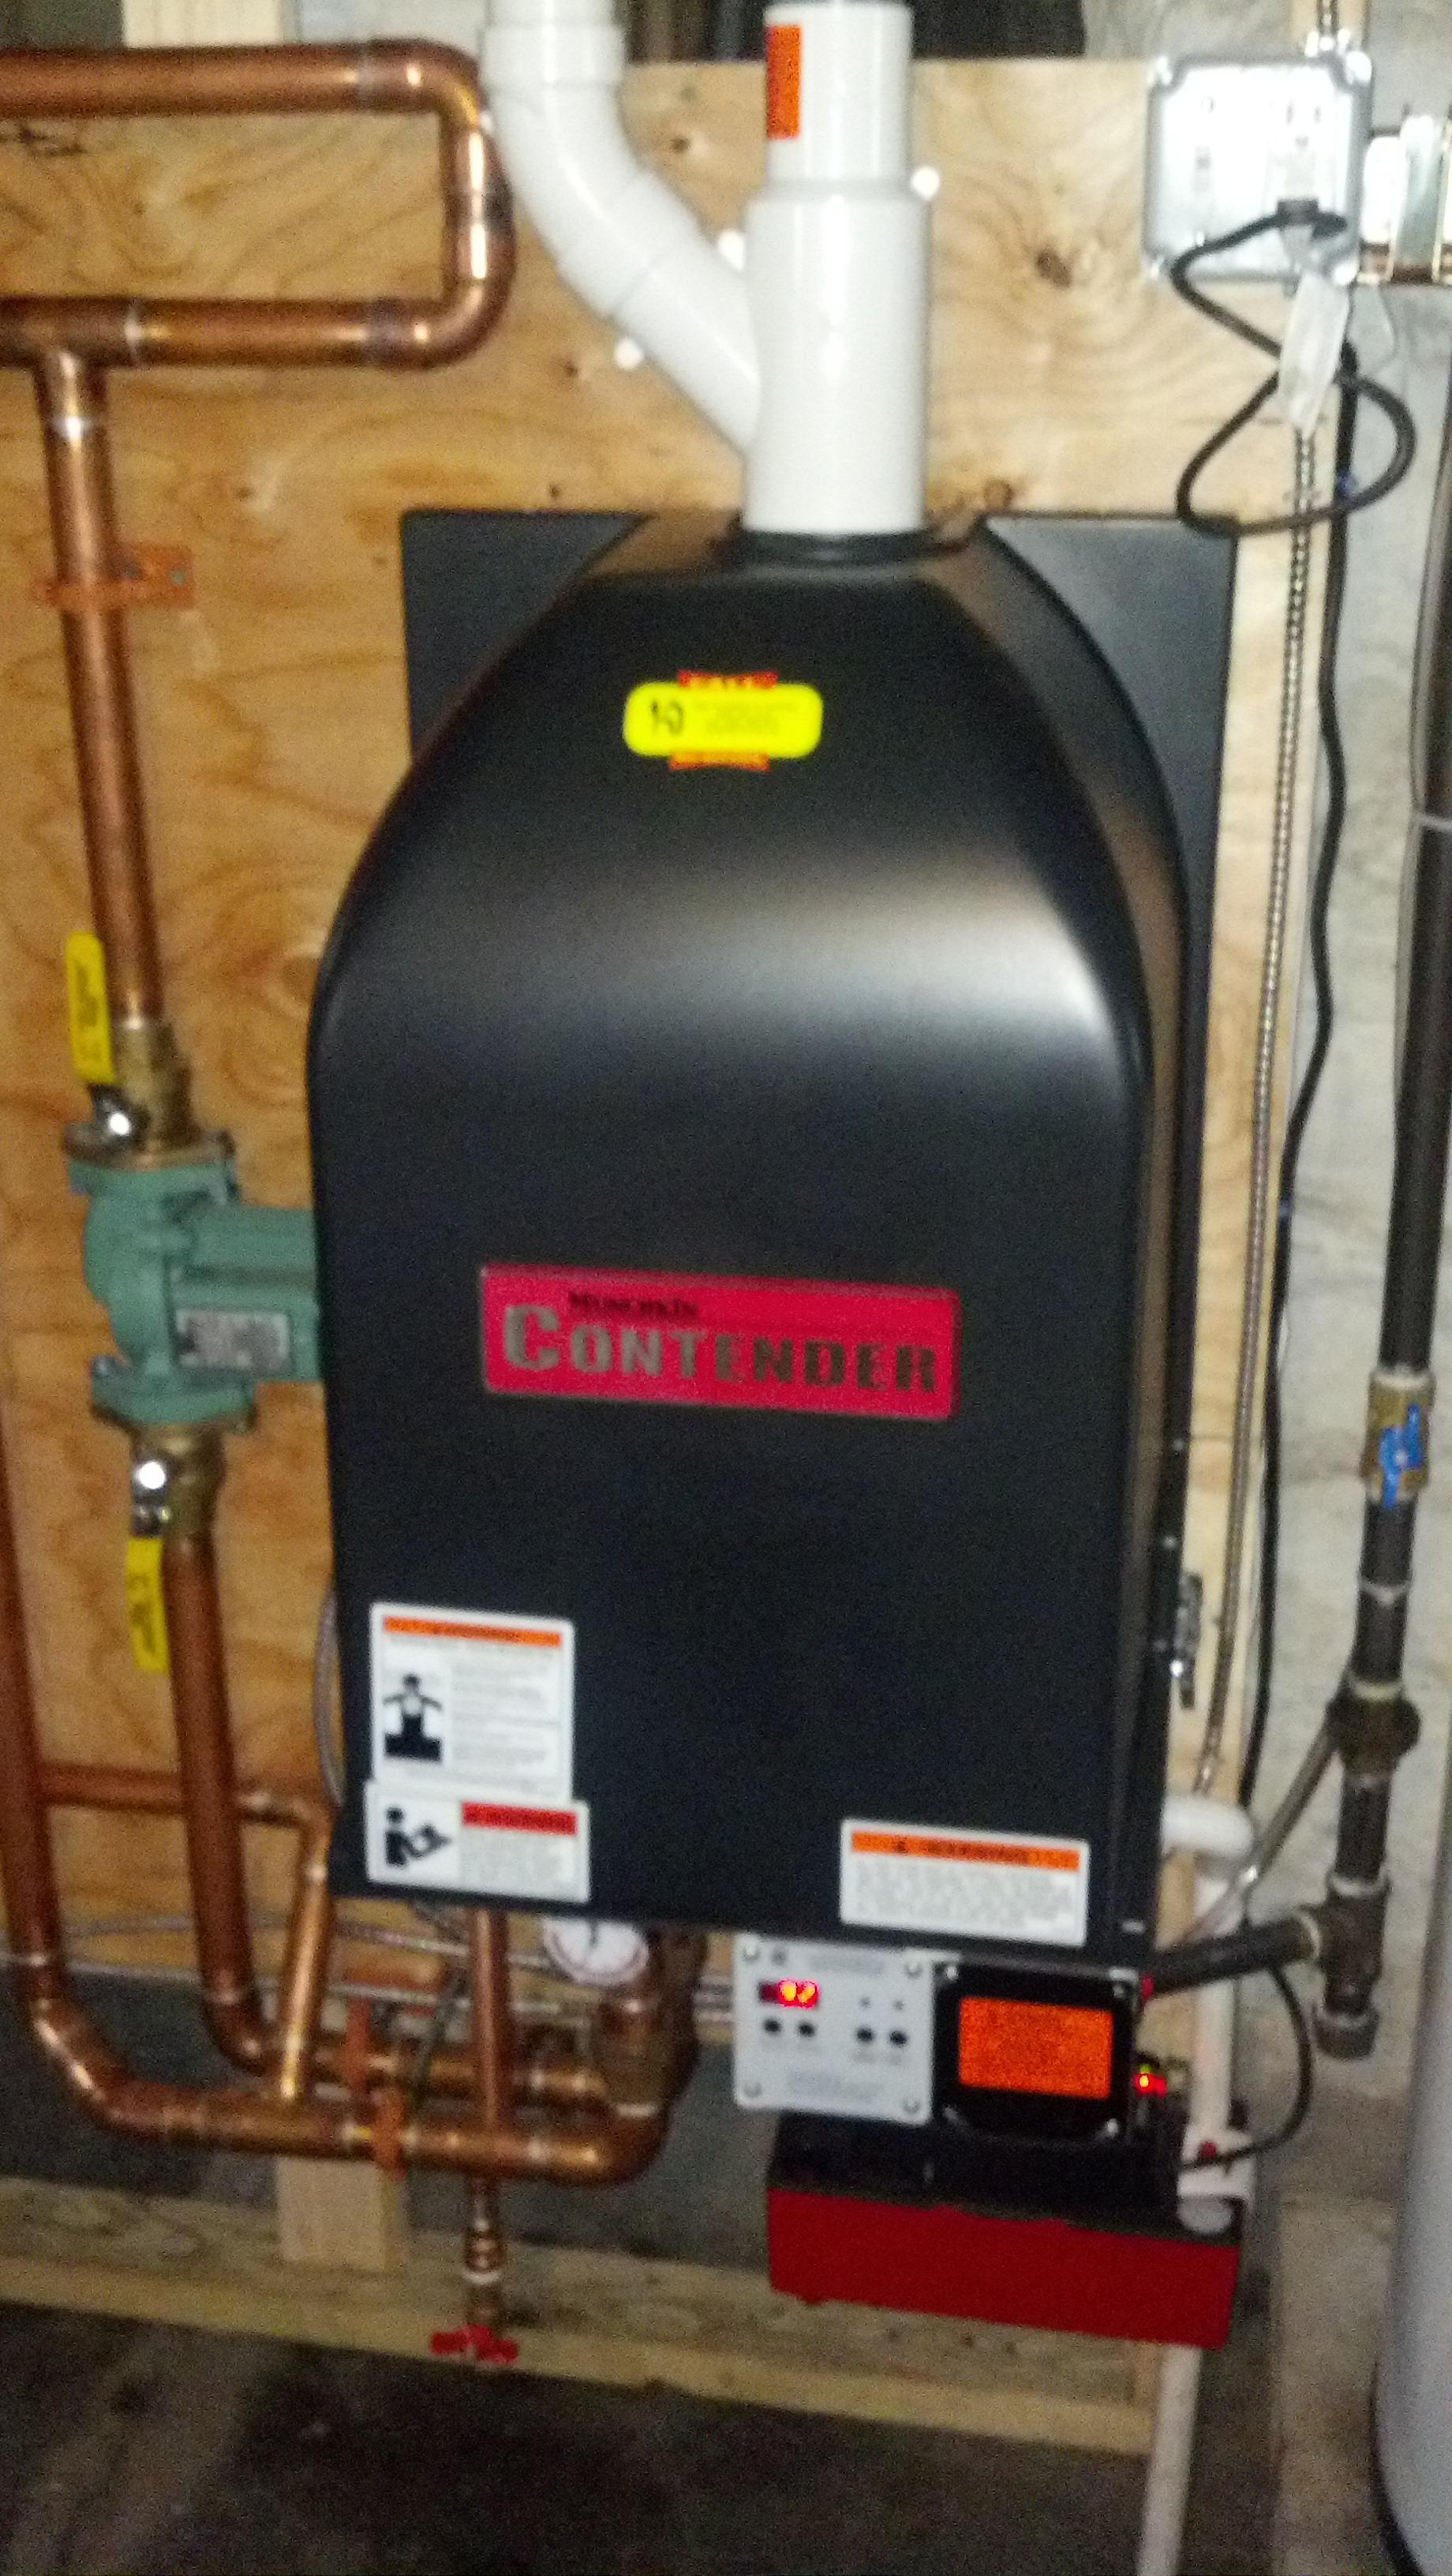 Boiler making loud noise when filling storage tank — Heating Help ...